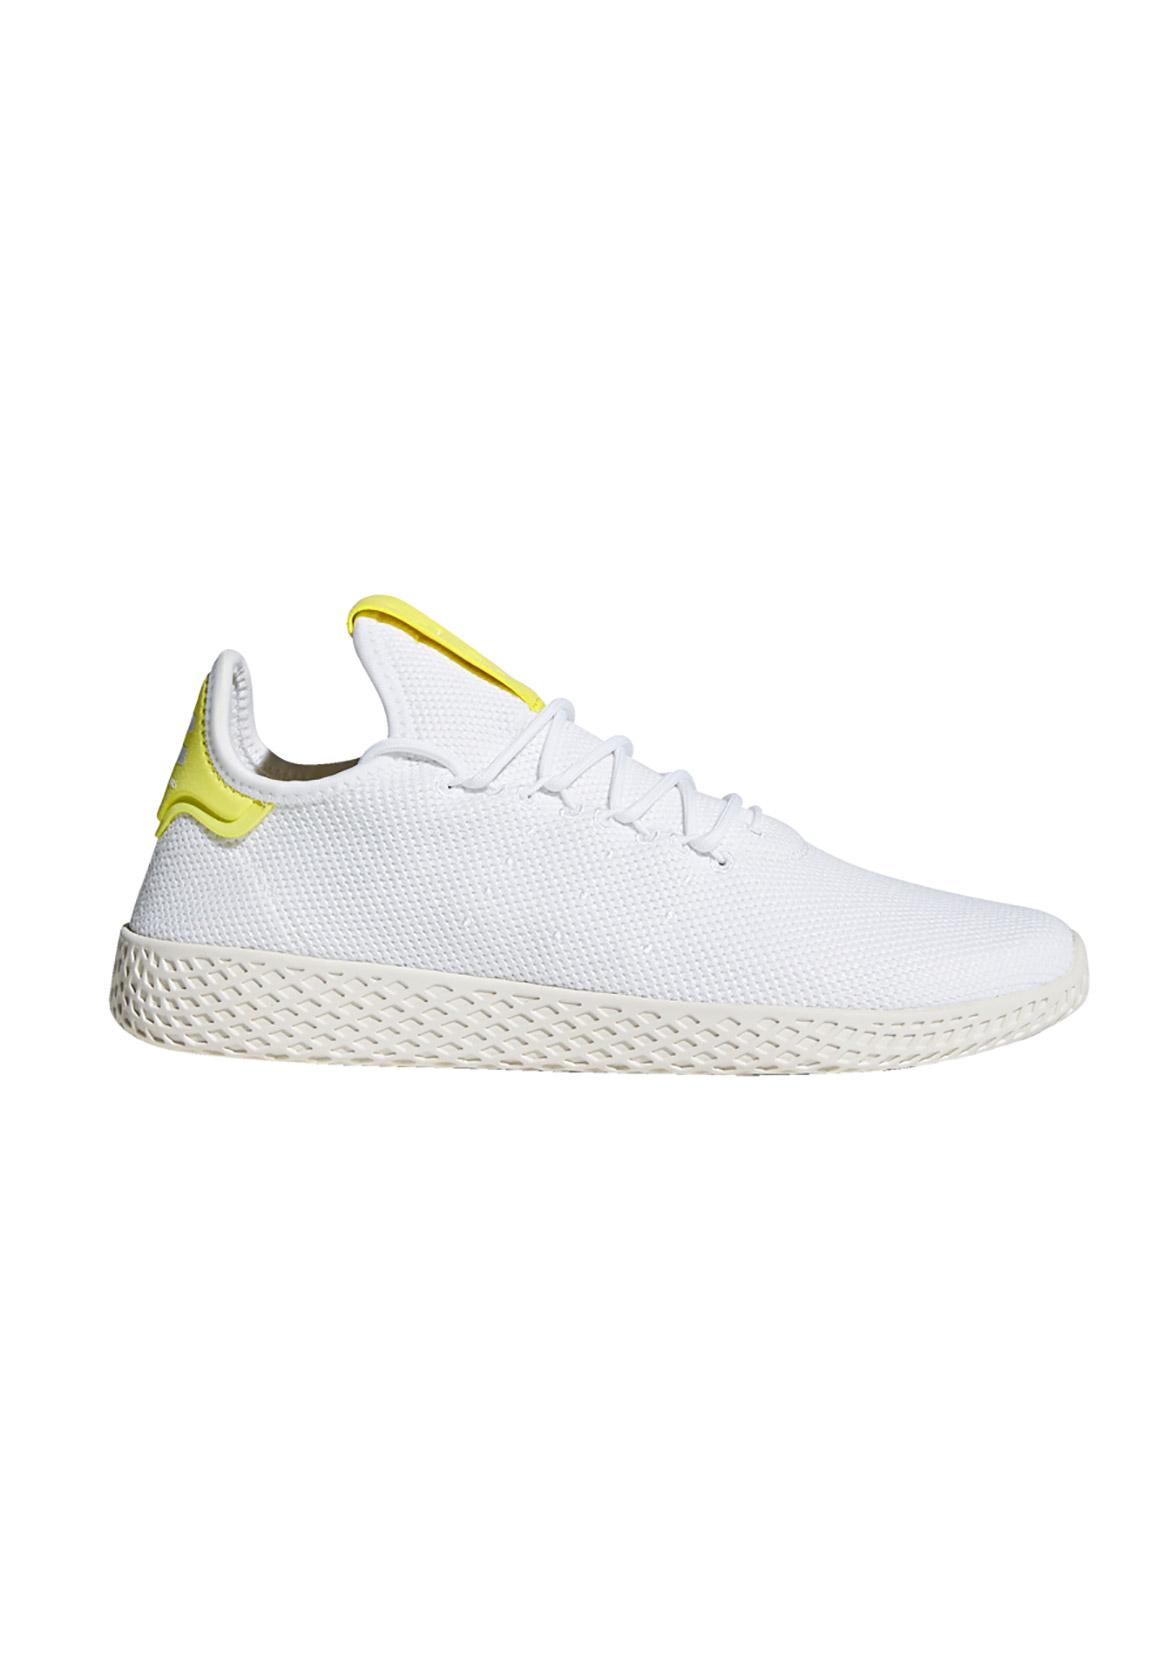 Adidas Original Sneaker PW TENNIS HU B41806 Weiß Gelb